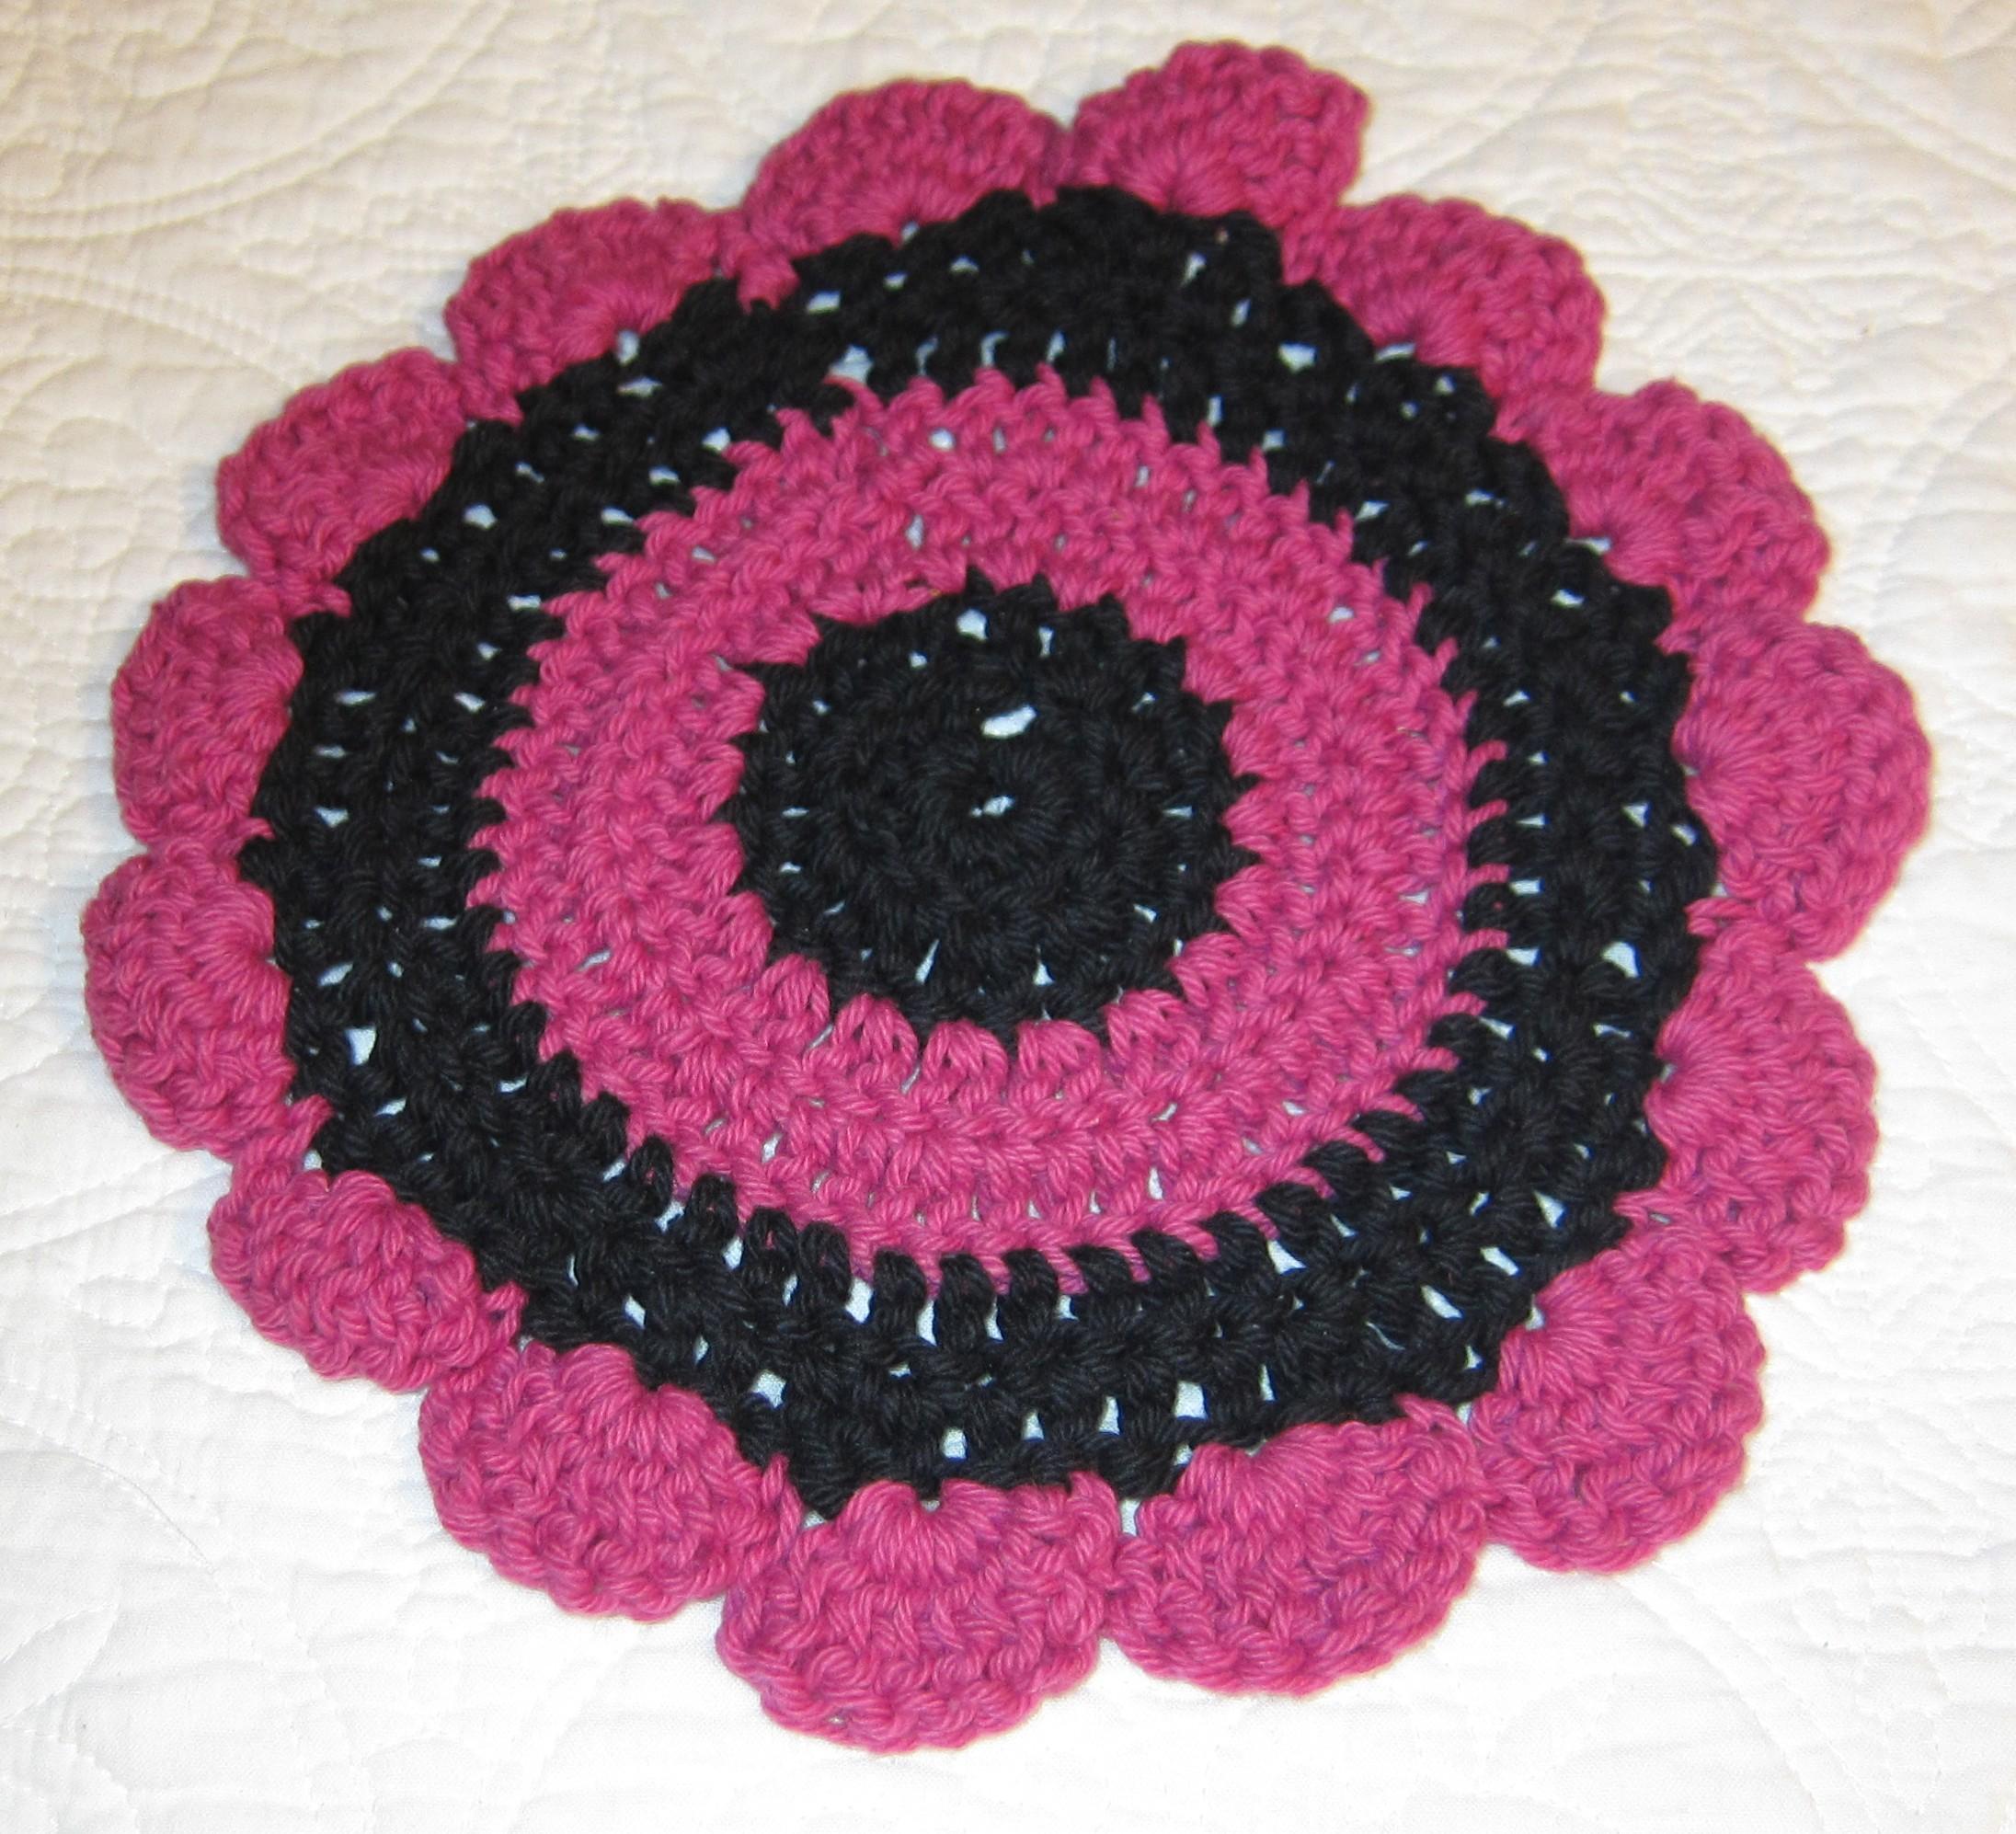 Crochet Dishclothwashcloth 100 Cotton Pink And Black Flower Shape